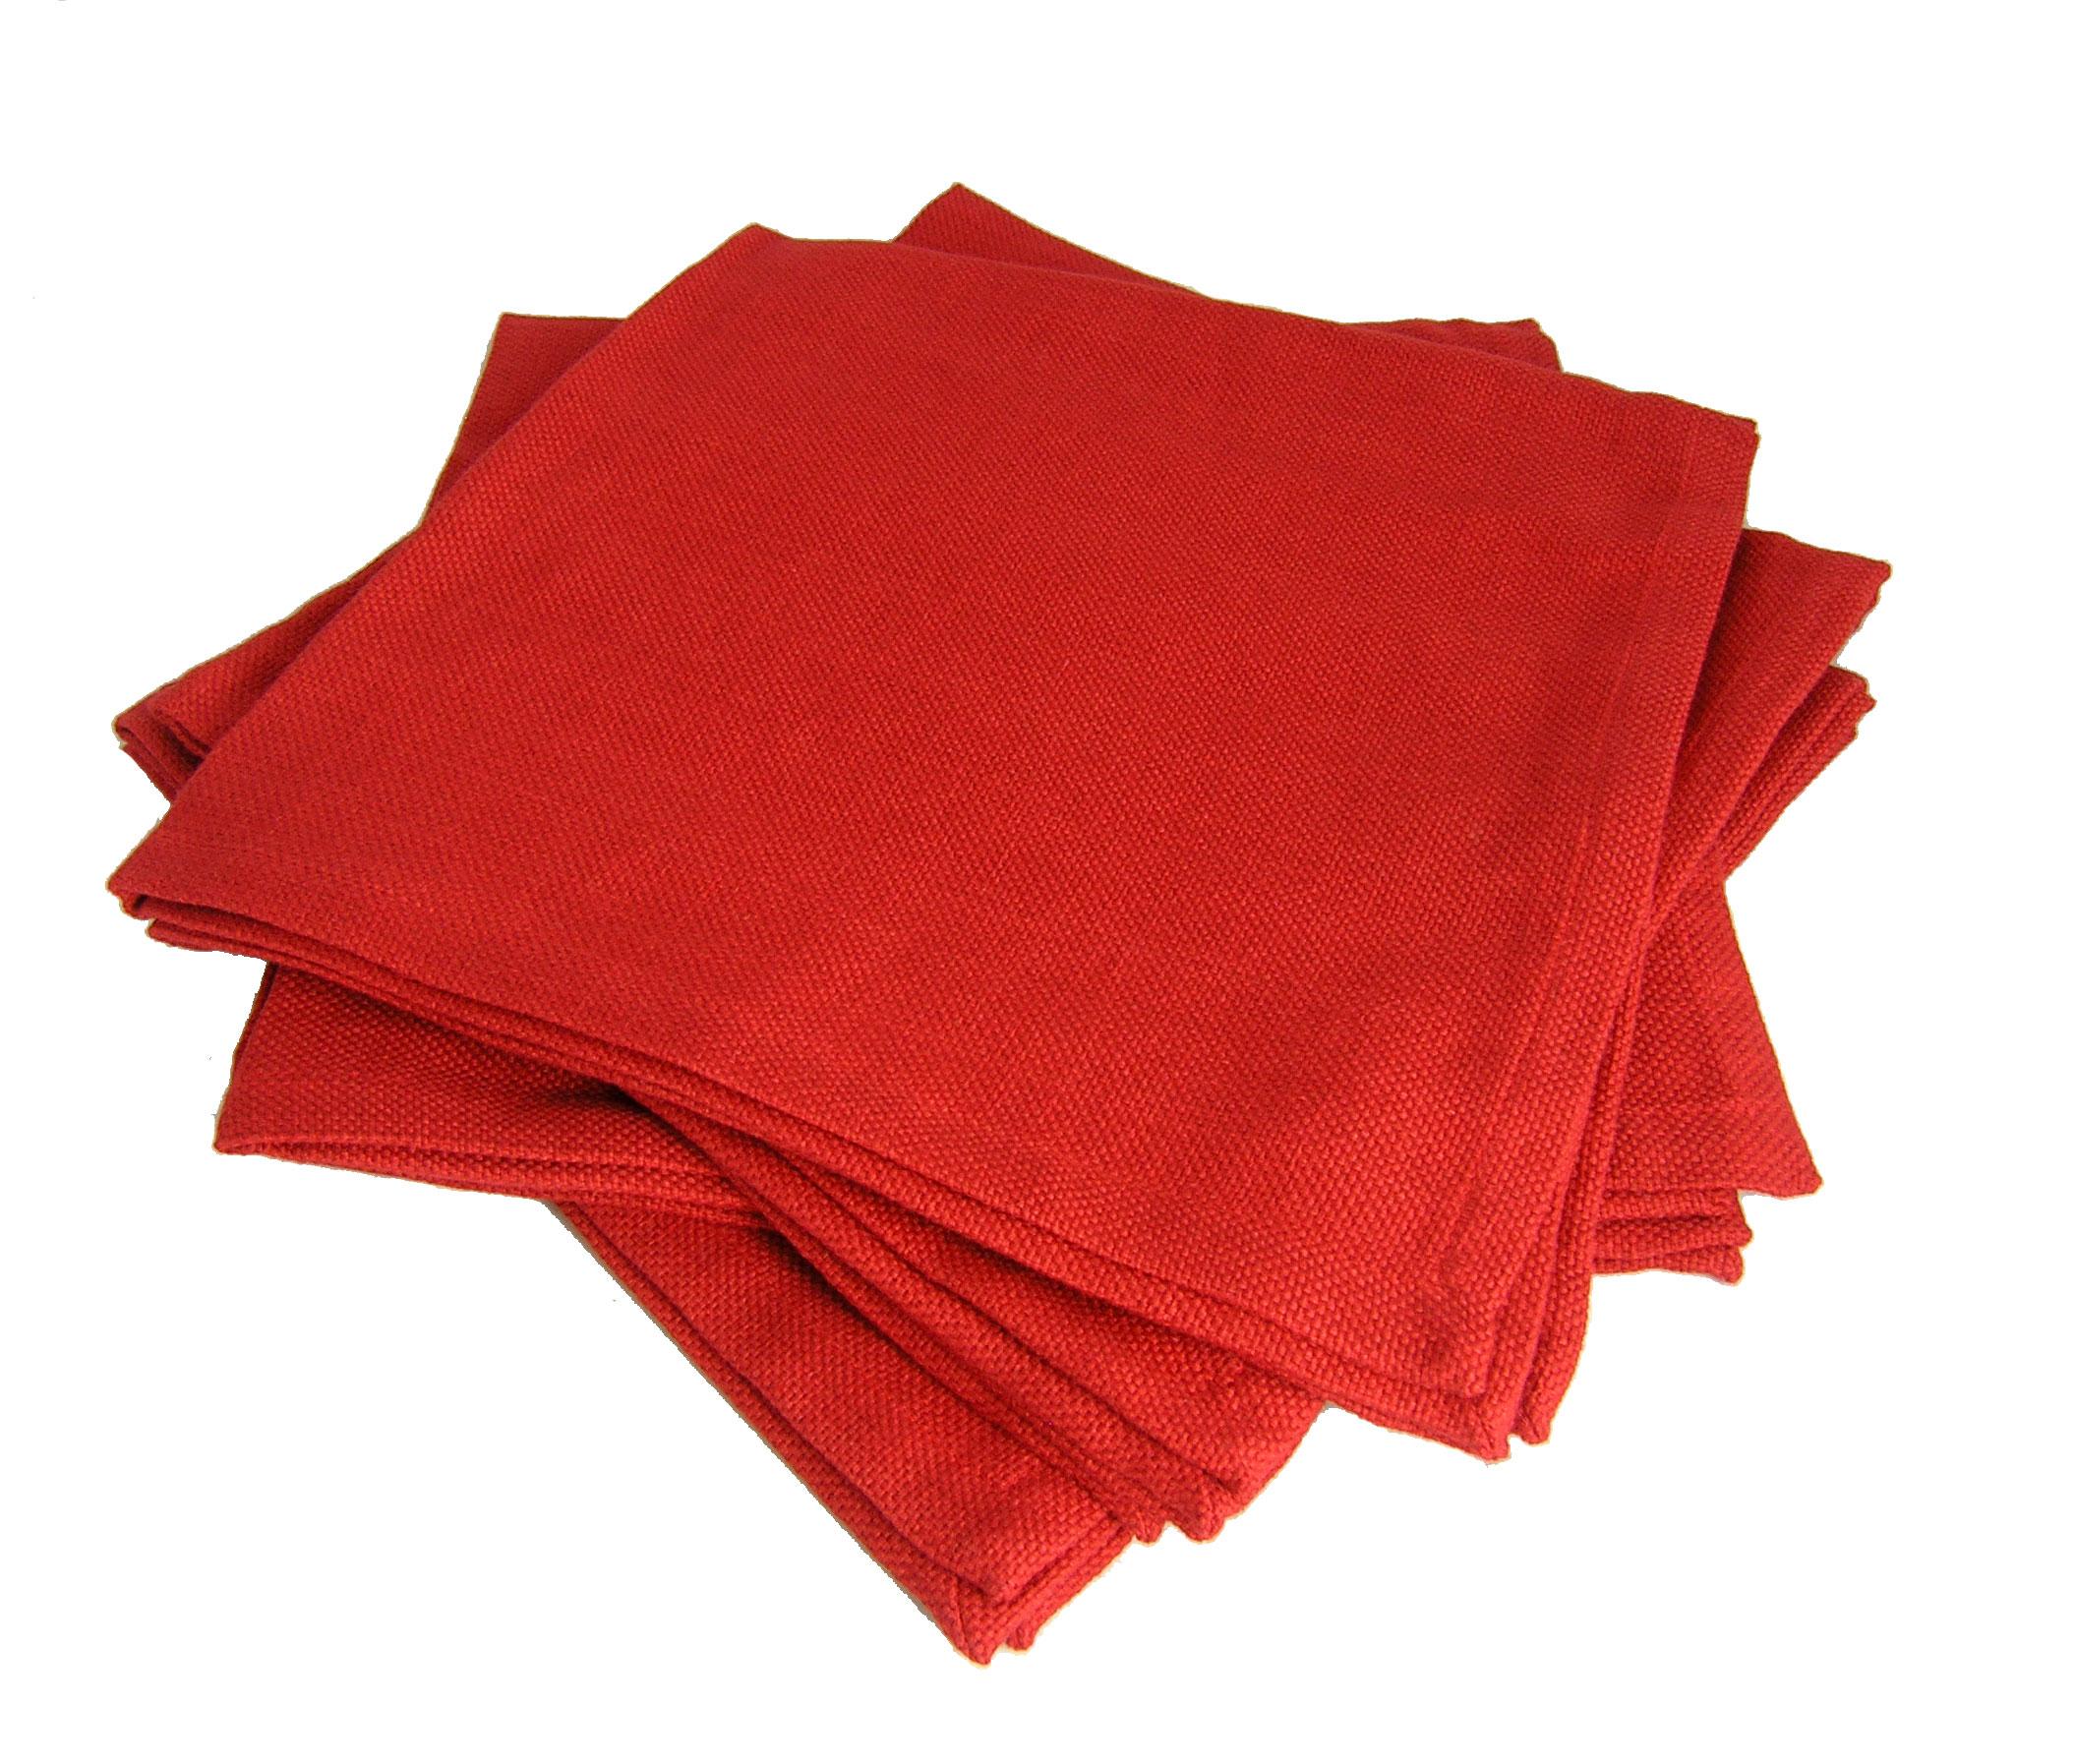 Classic Red Napkins Set Of 4 Garden Artisans Llc